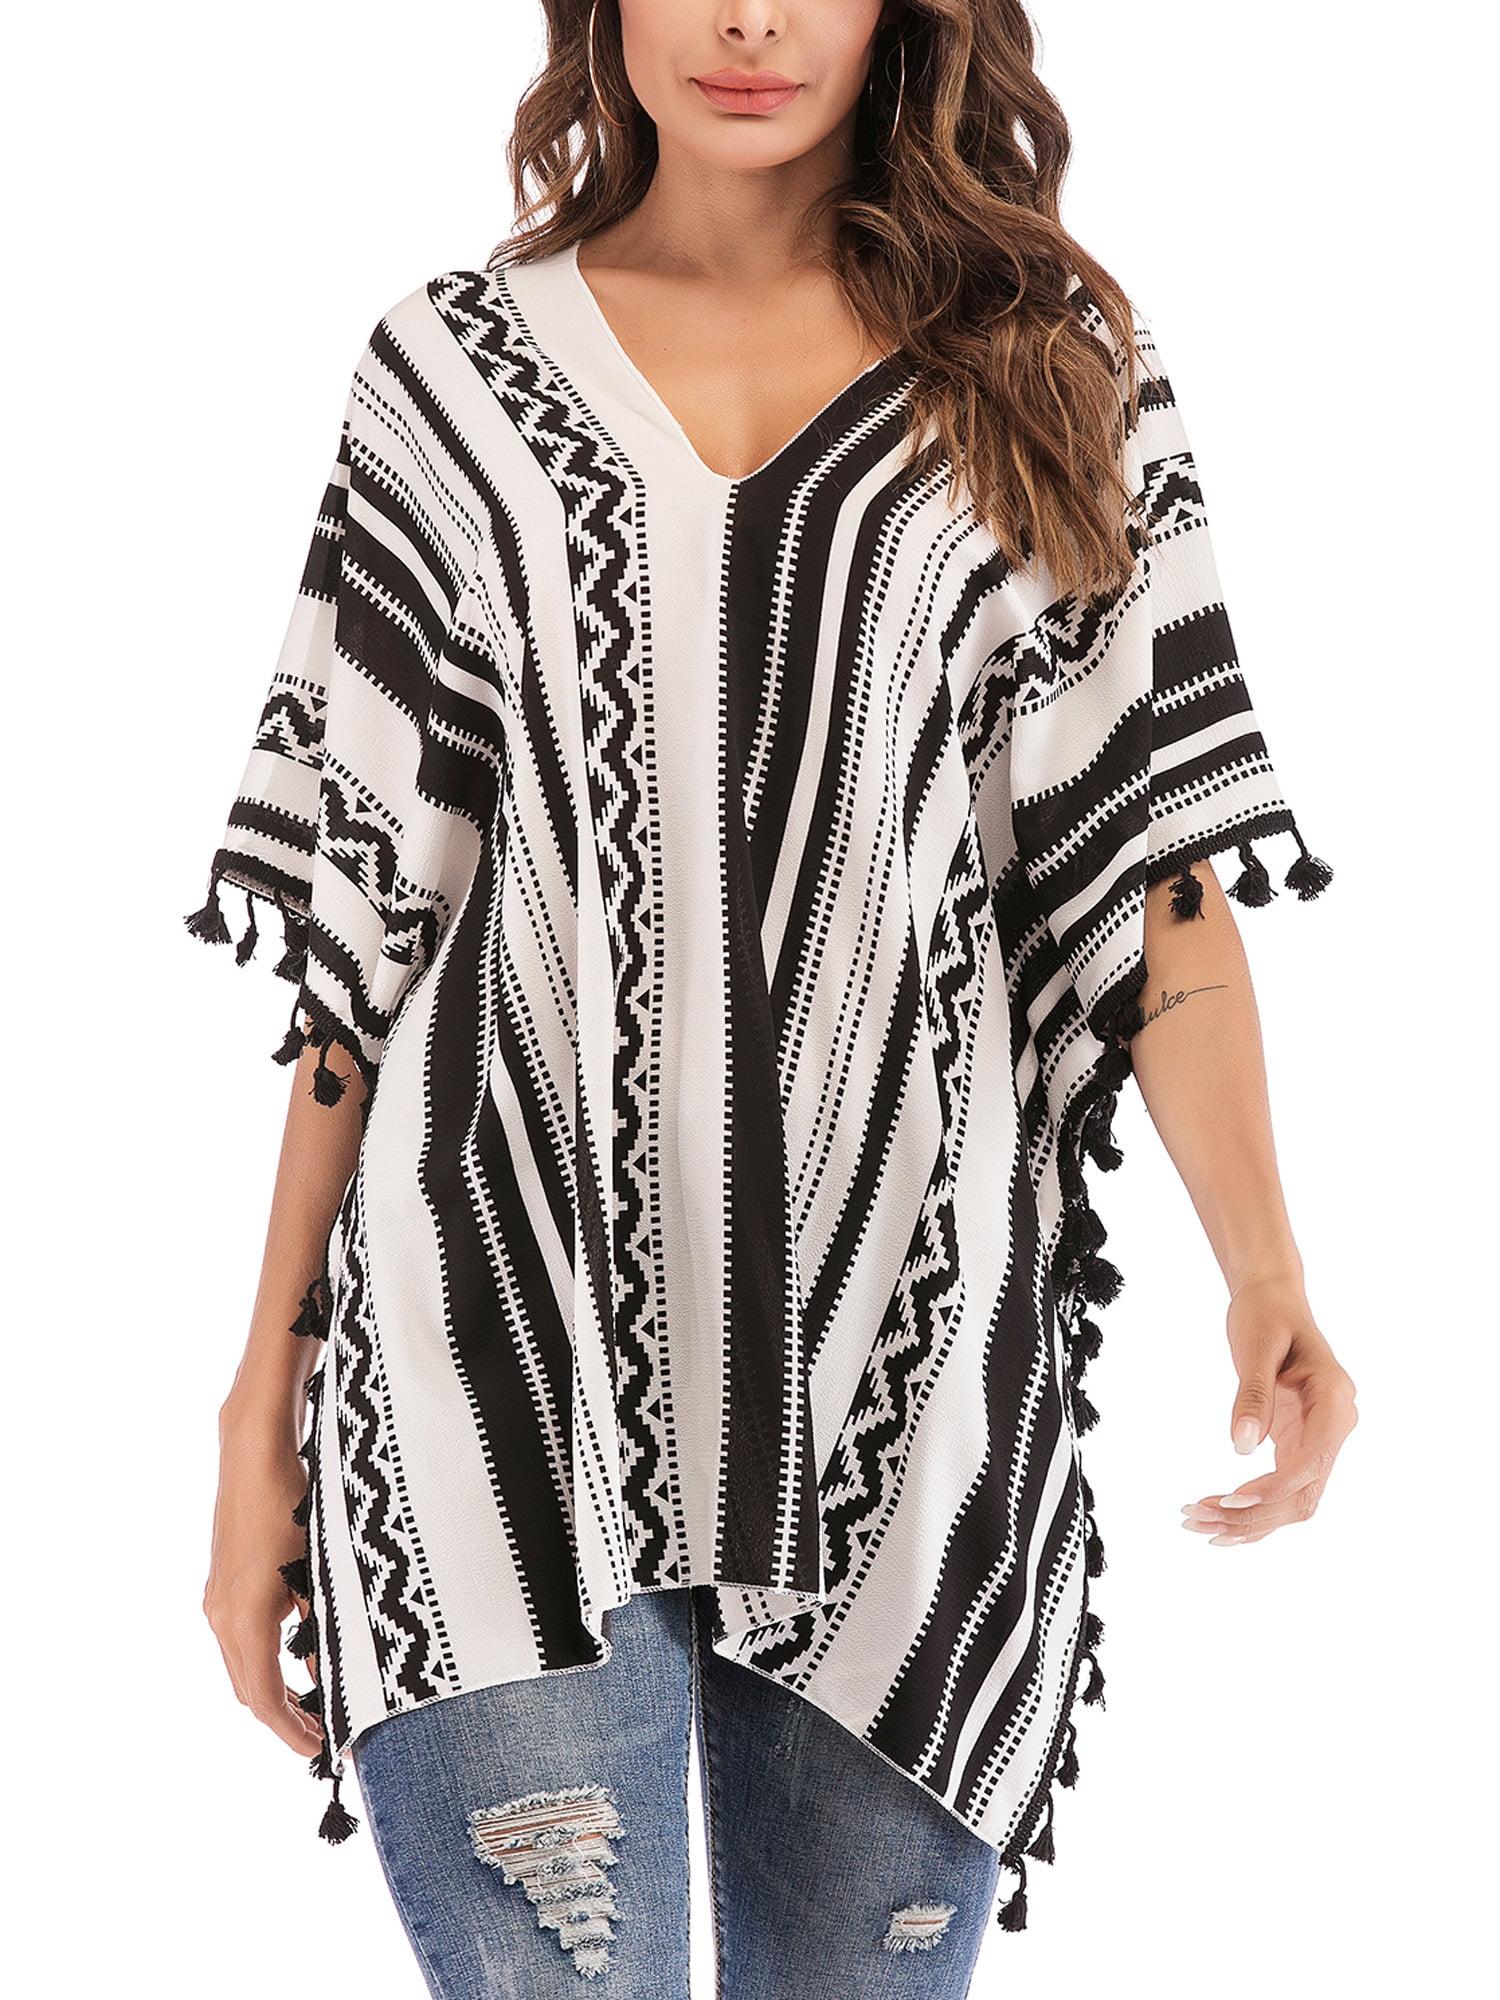 3146343c63394 Women Chiffon Tassel Bohemian Swim Cover Ups Bikini Tunic Beach Dress  Summer Casual Shirt Dress Irrgular Hems Boho Style Poncho Swimsuit Beach  Stylish ...